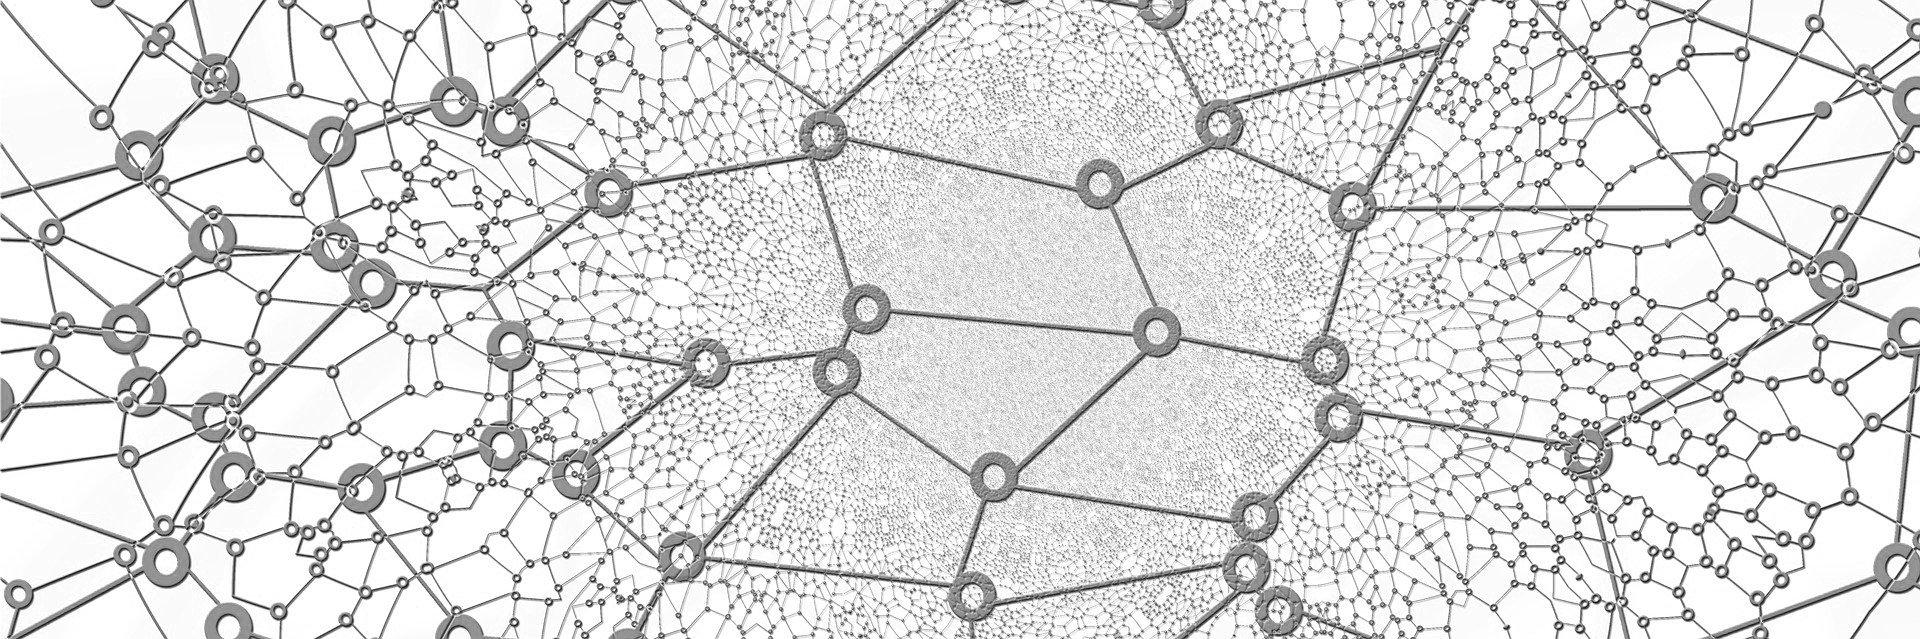 network-3139214_1920